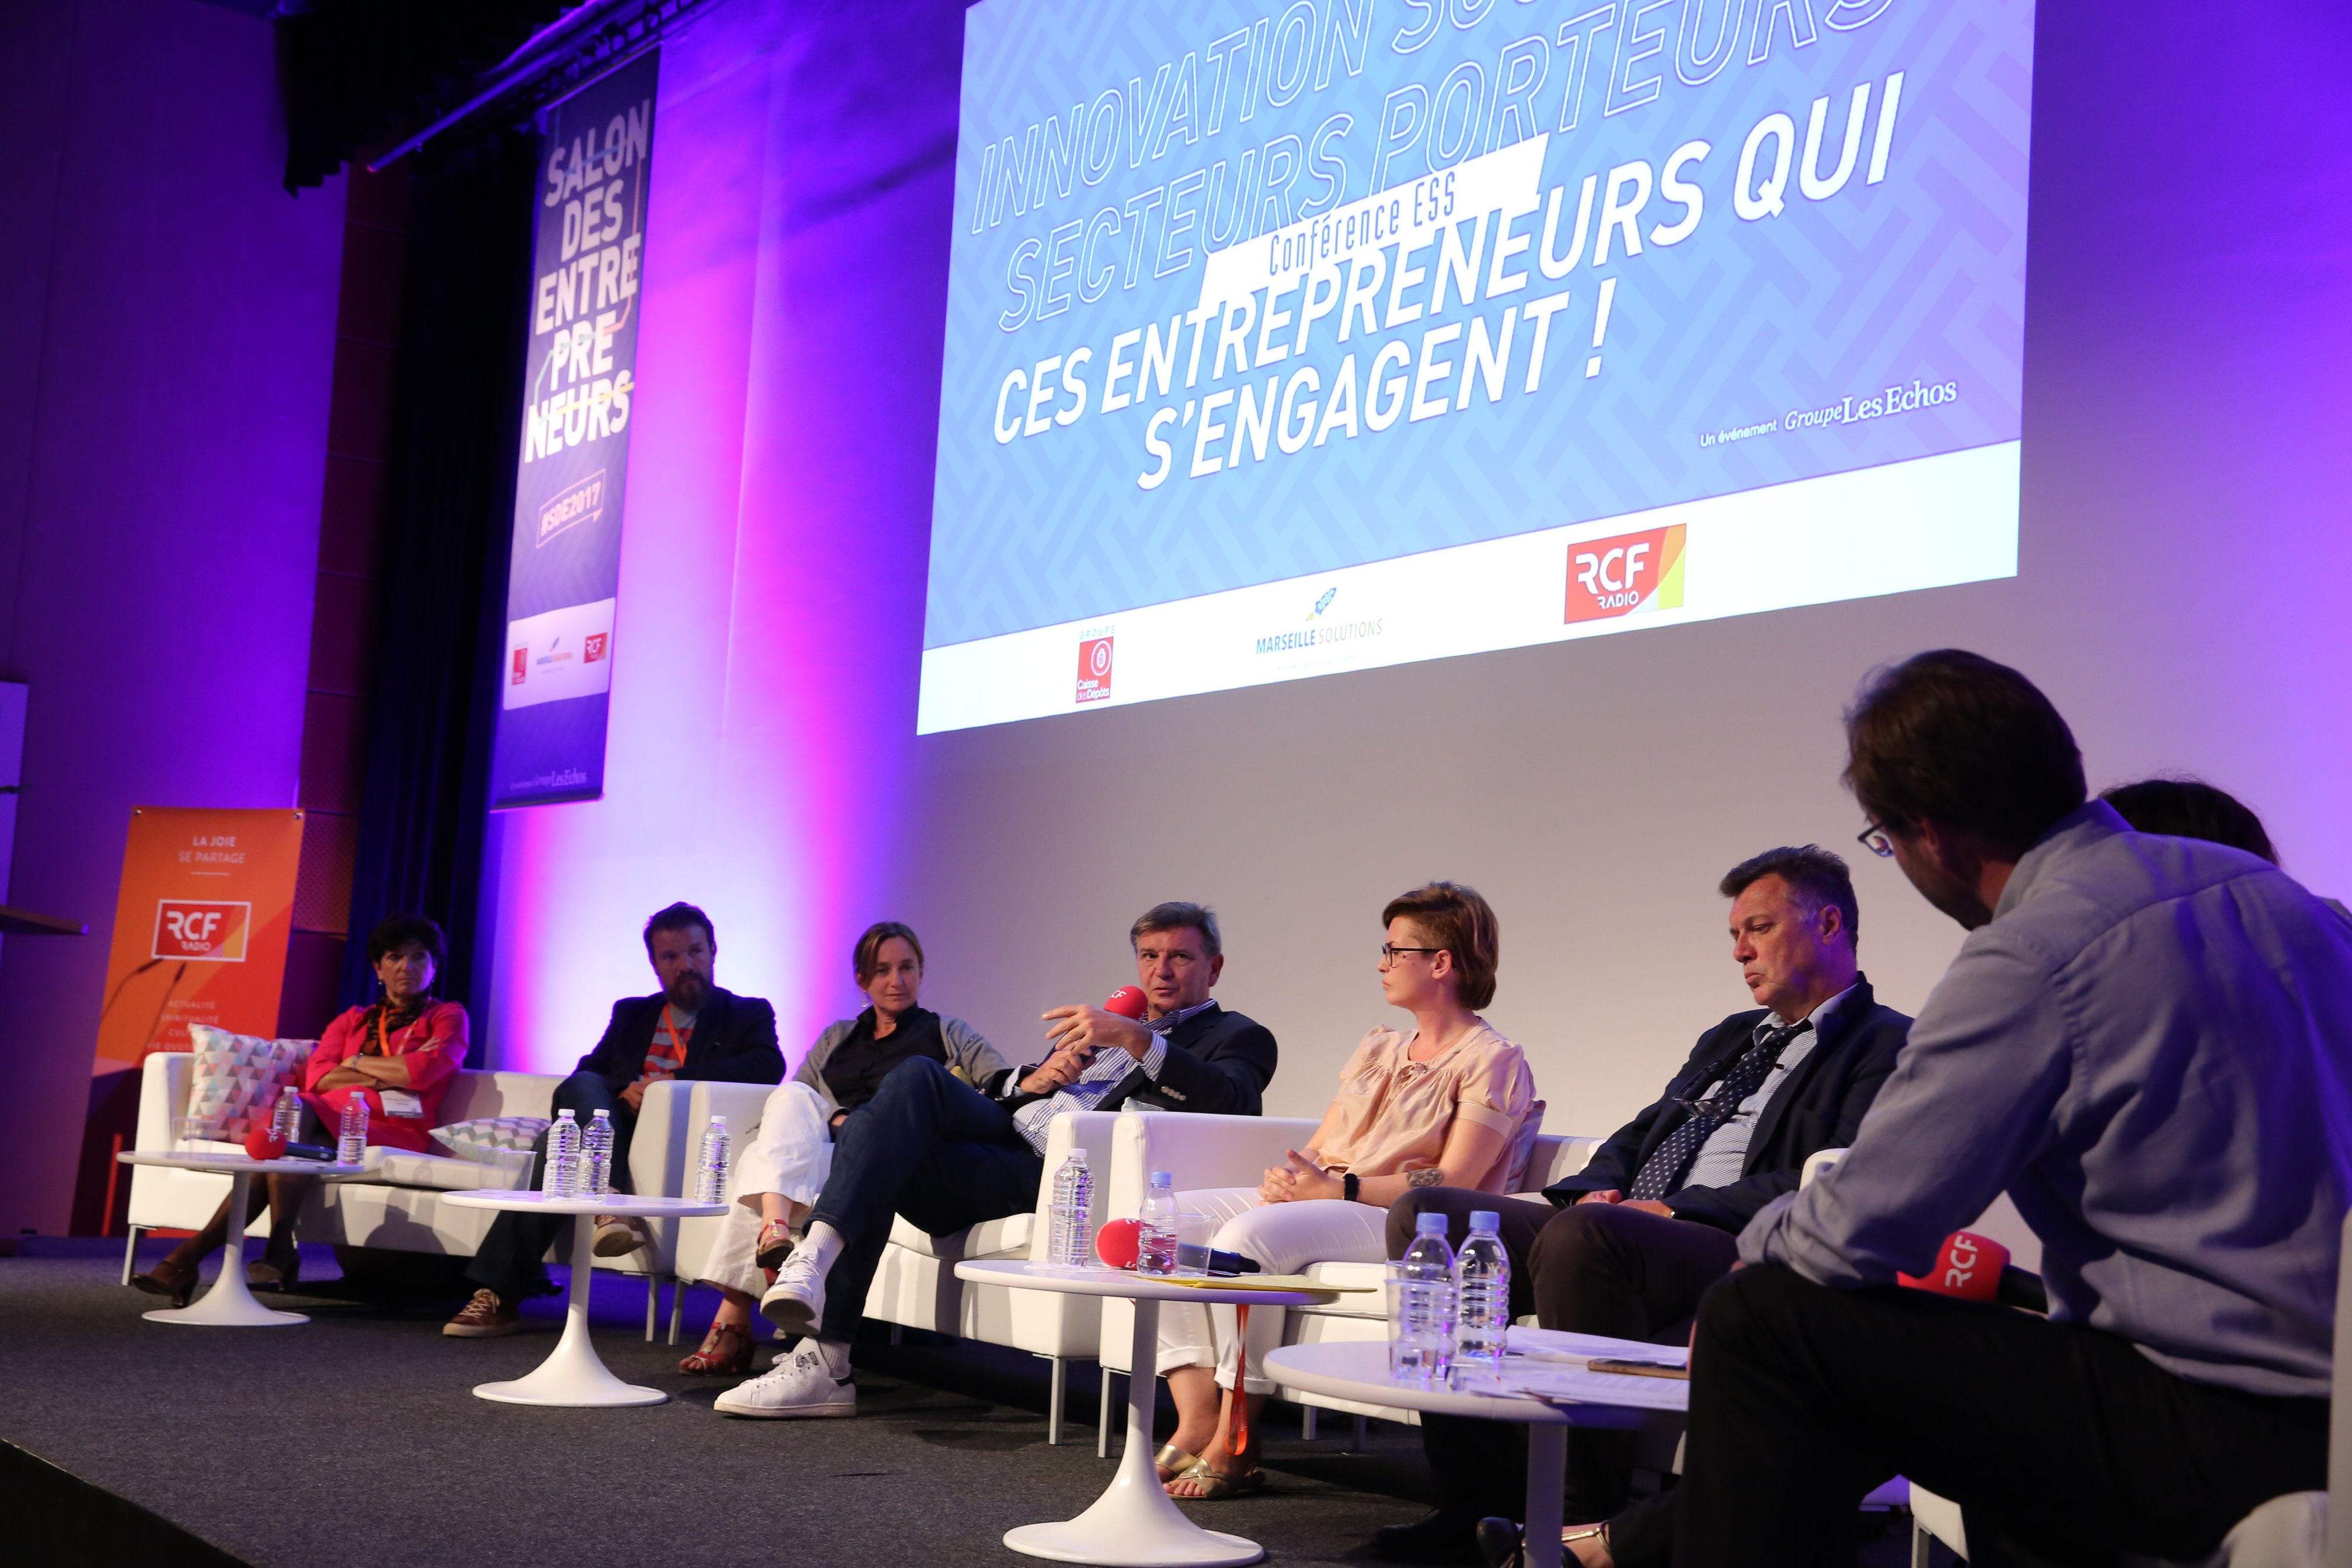 Conférence Innovation Sociale au SDE